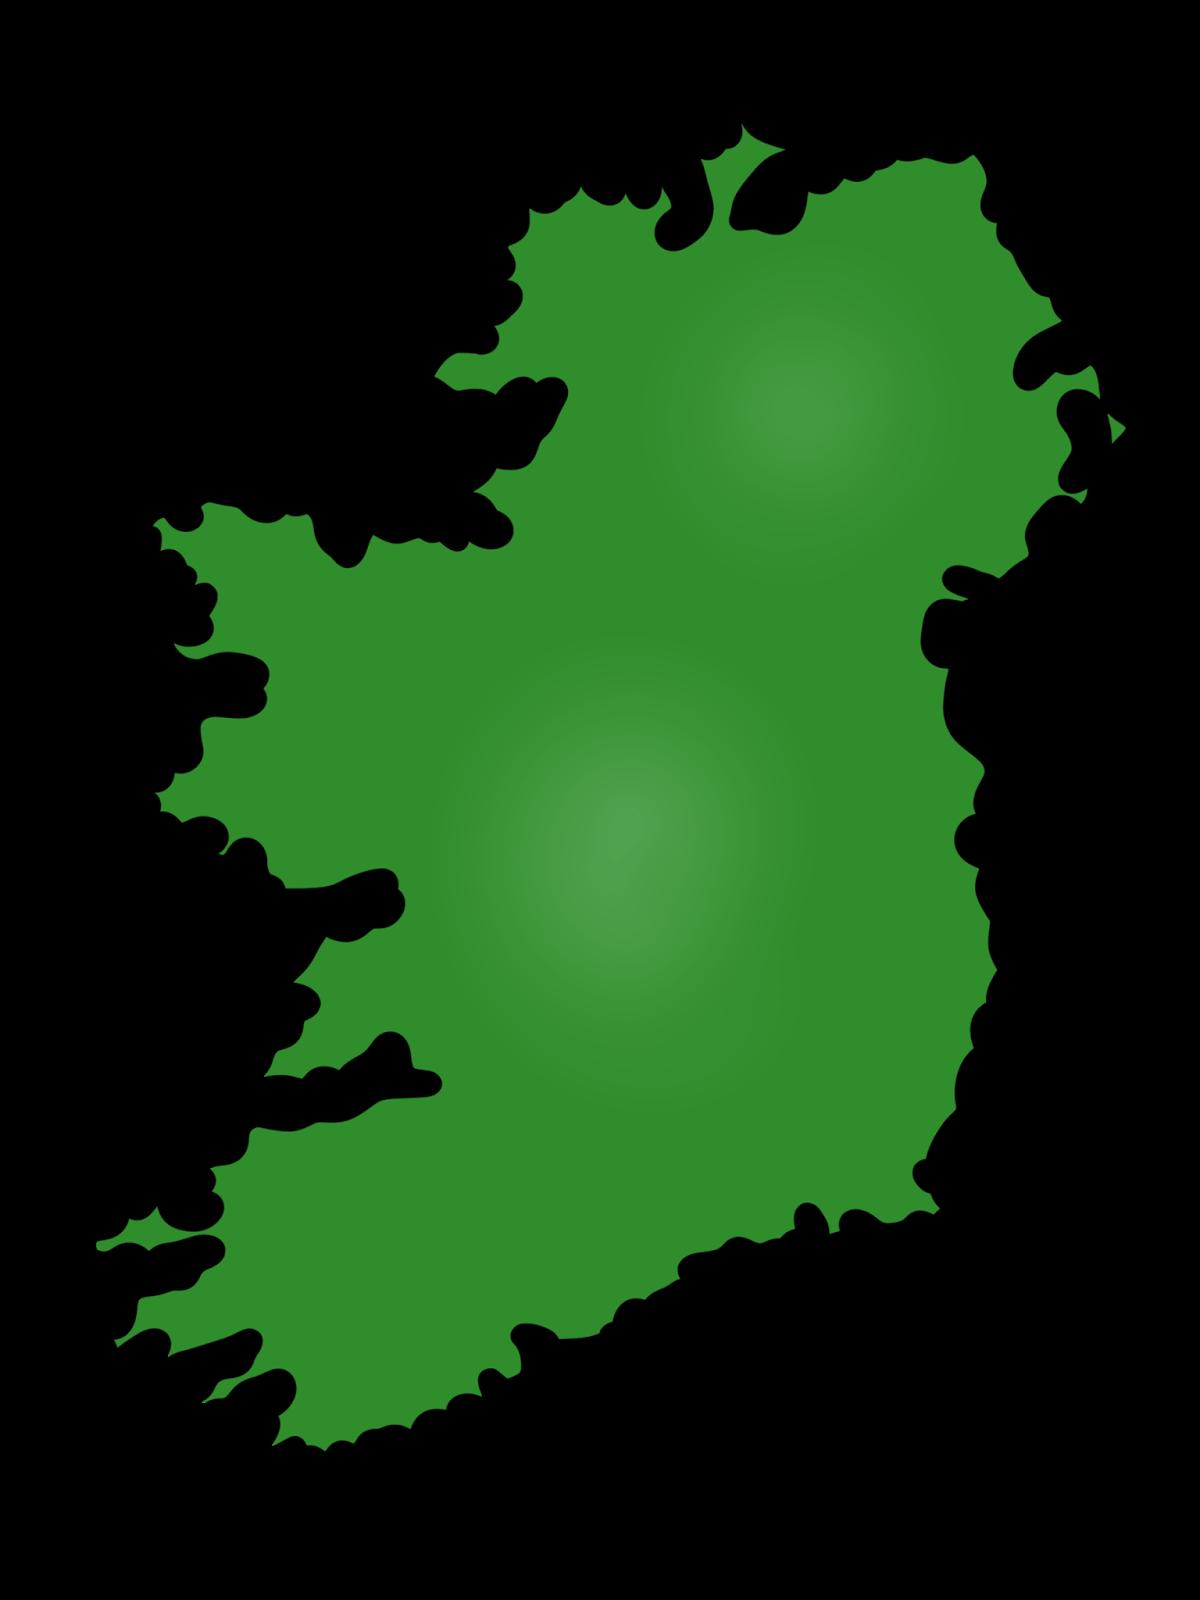 1200x1600 Top 71 Ireland Clip Art